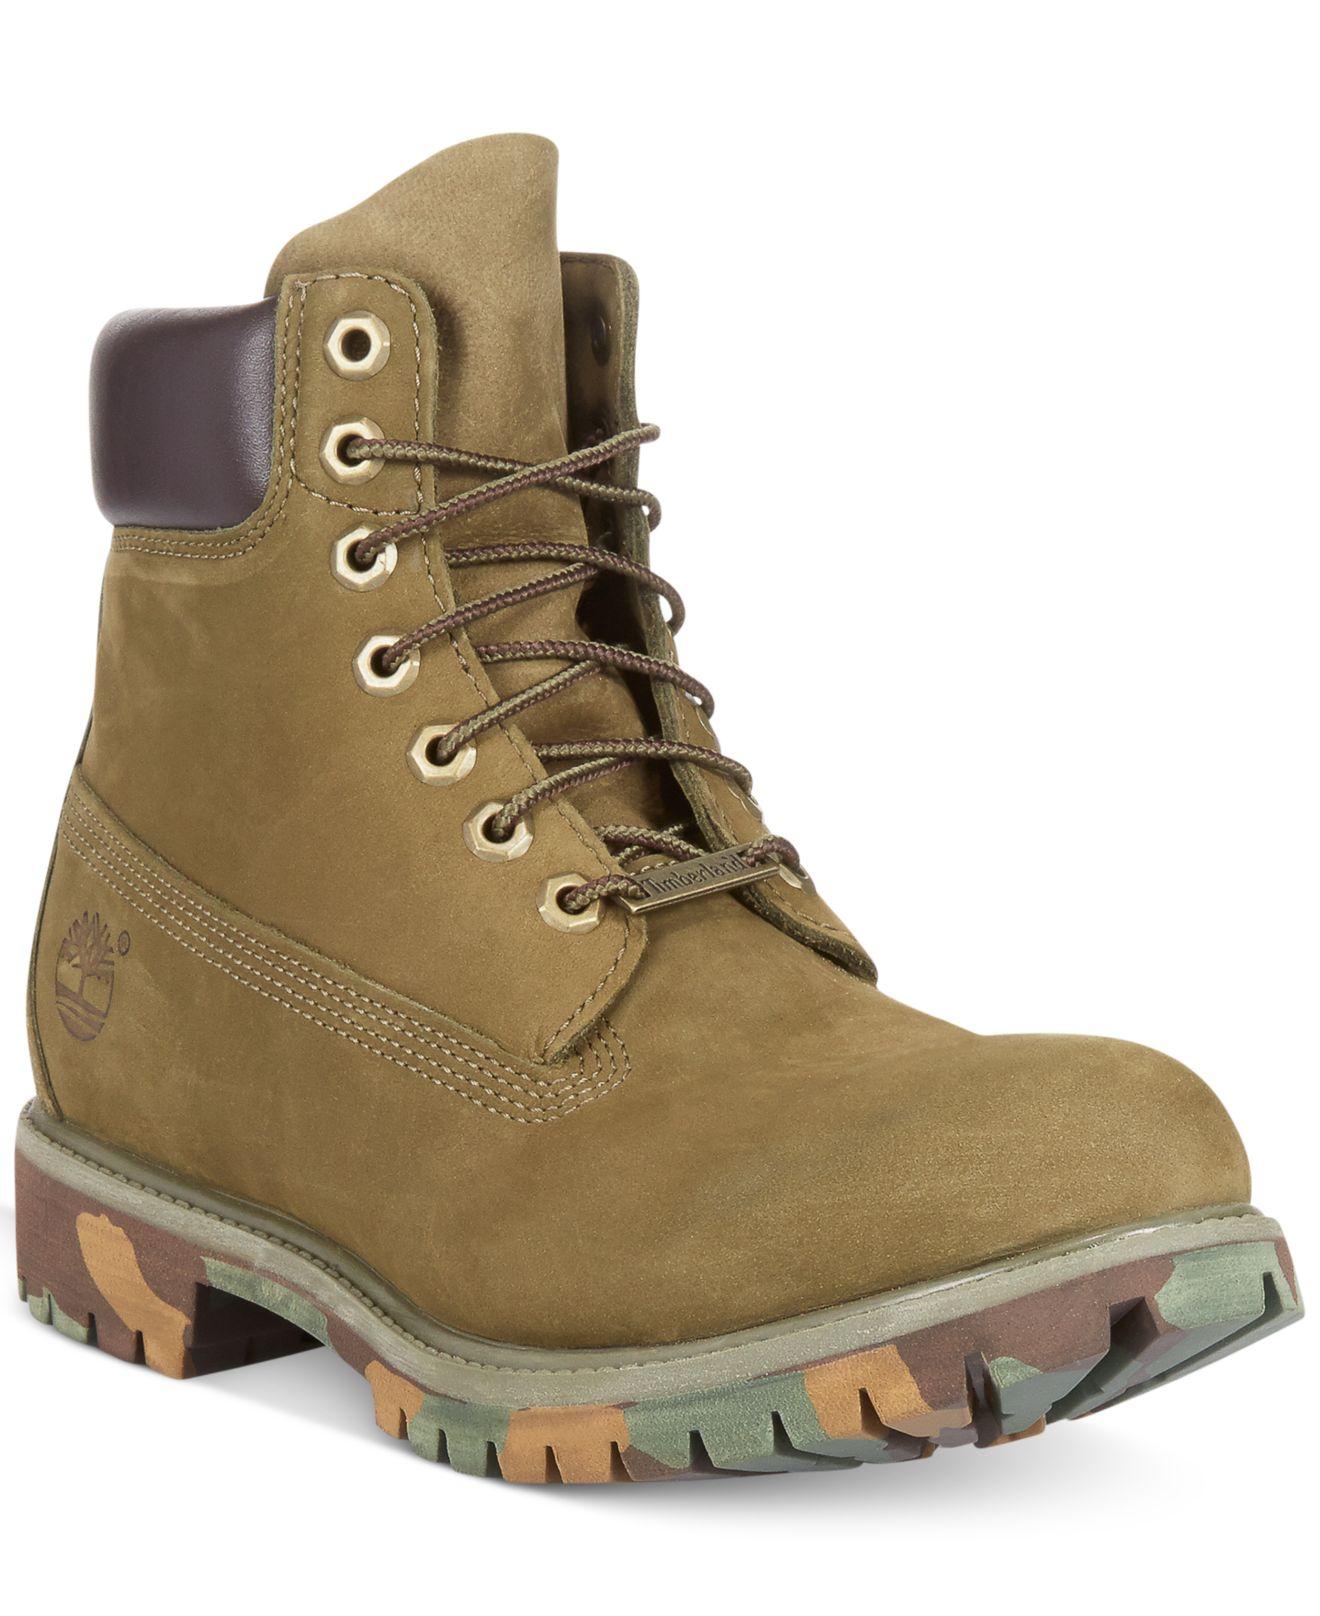 timberland olive green boots debezettingnl